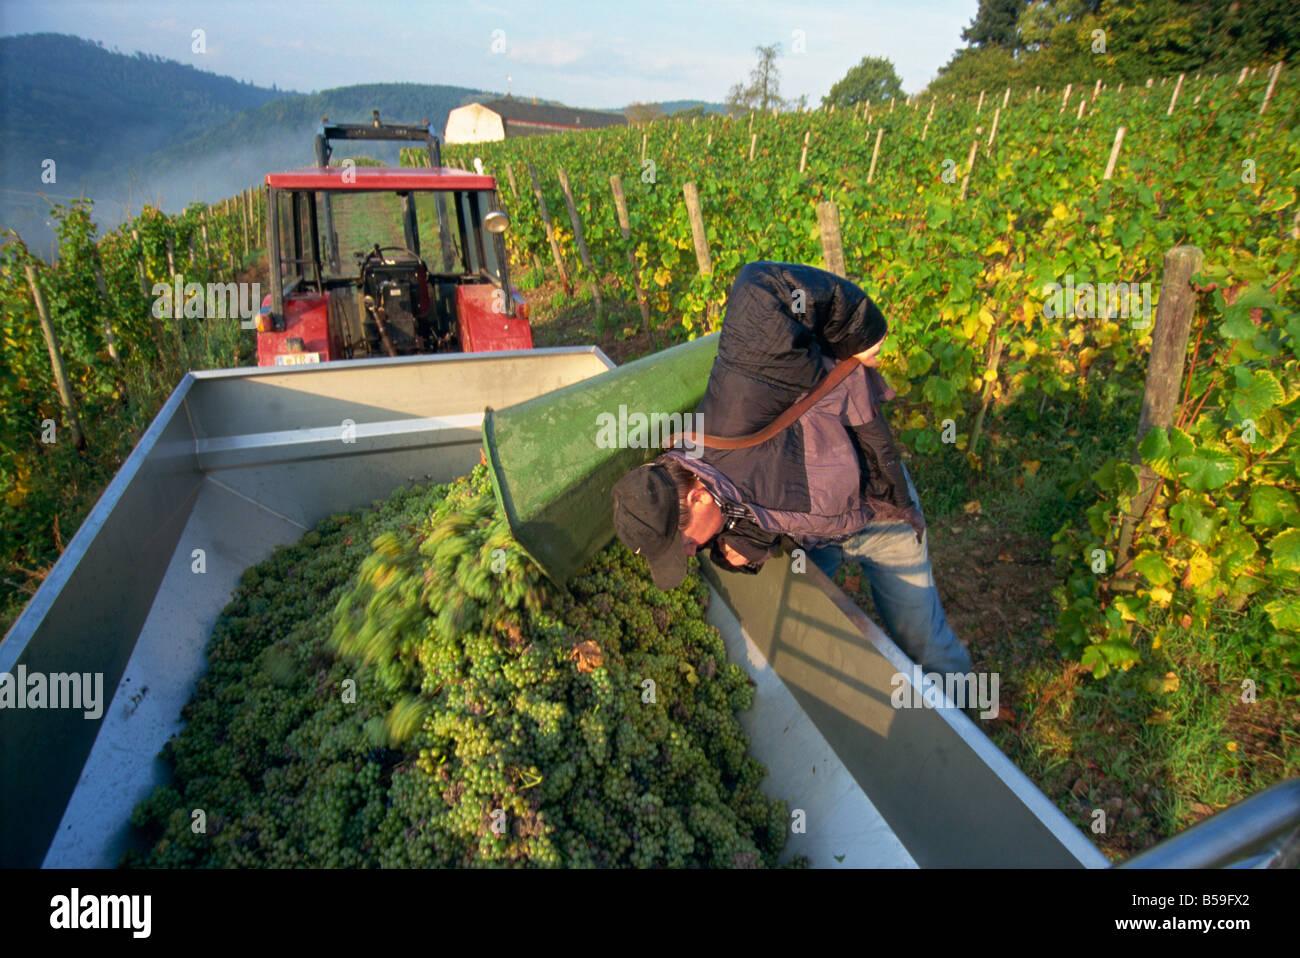 Grape harvest, Mosel Valley, Rheinland-Pfalz, Germany, Europe - Stock Image